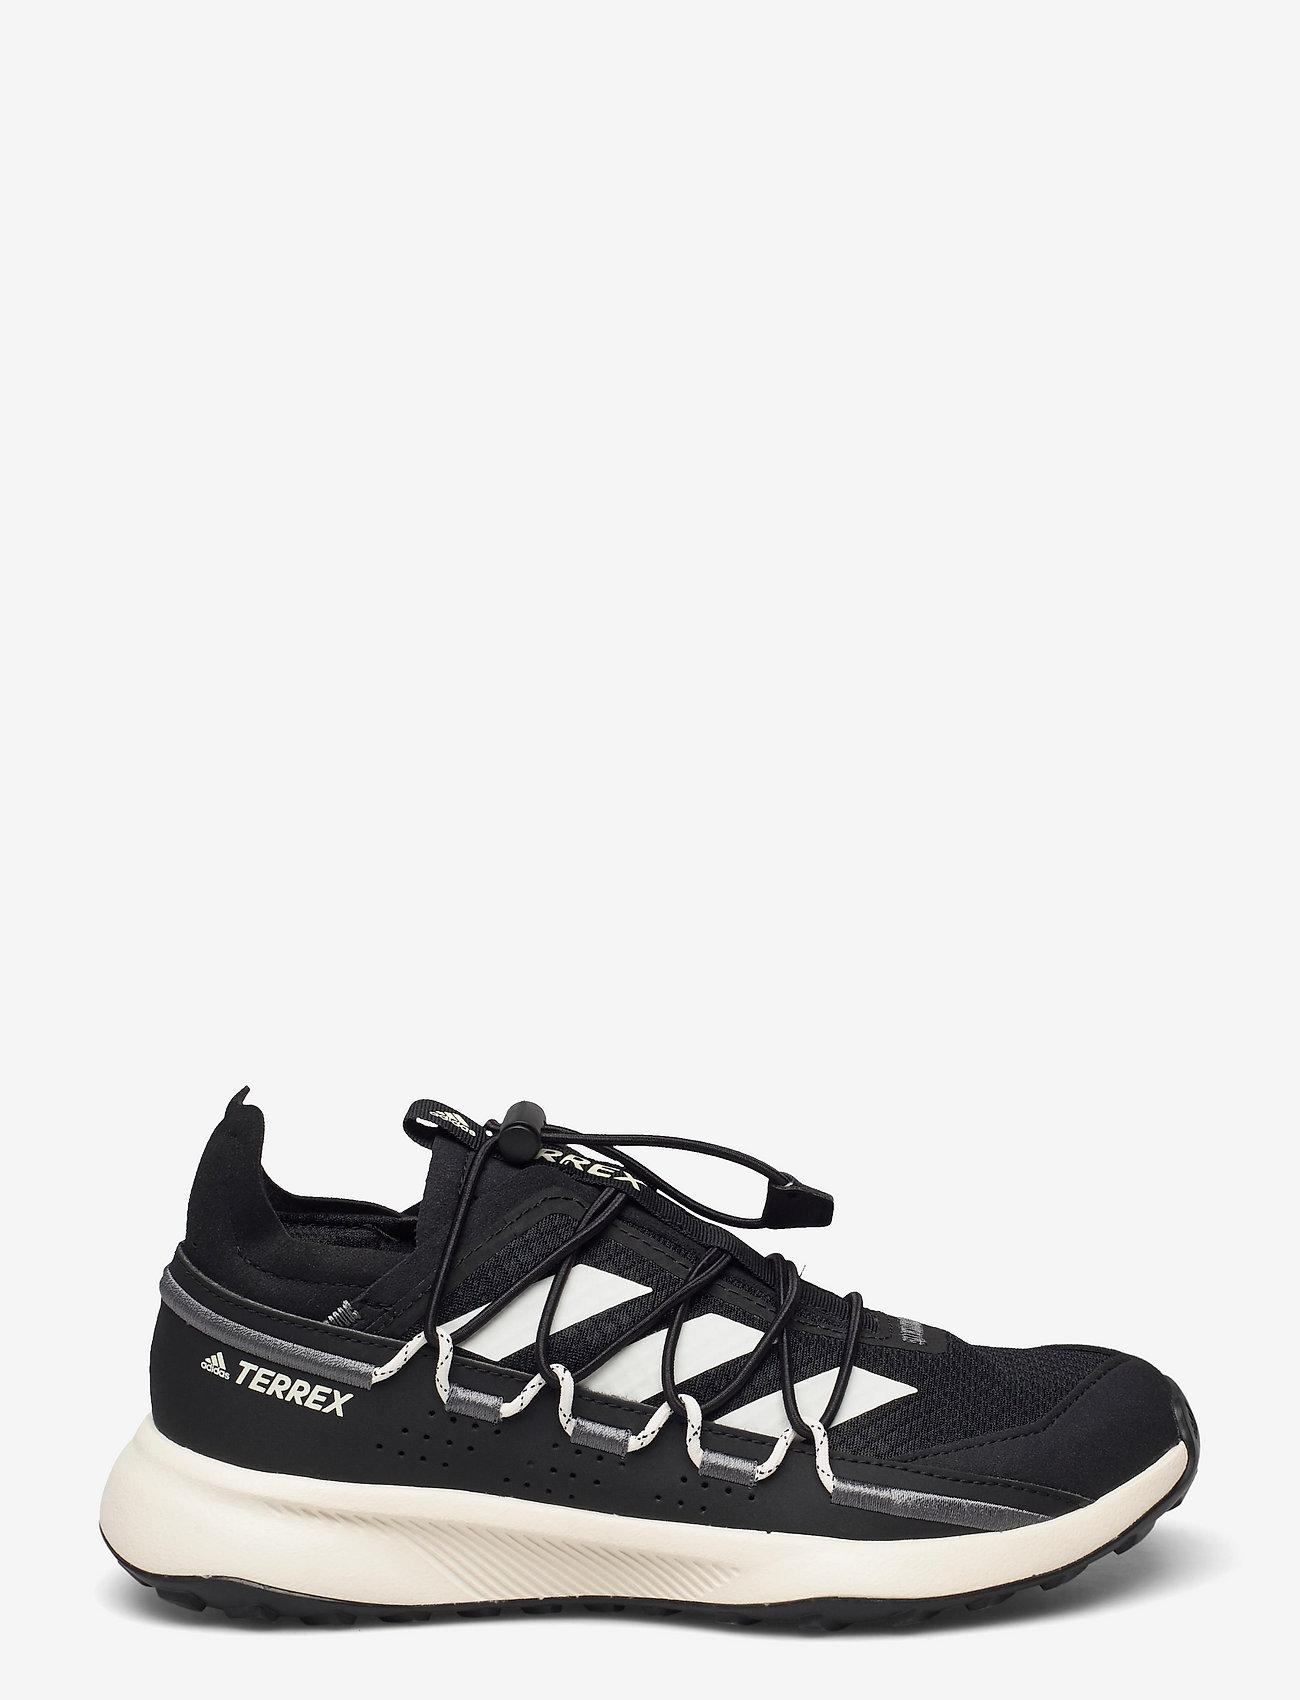 adidas Performance - Terrex Voyager 21 Travel  W - running shoes - cblack/cwhite/grefiv - 1